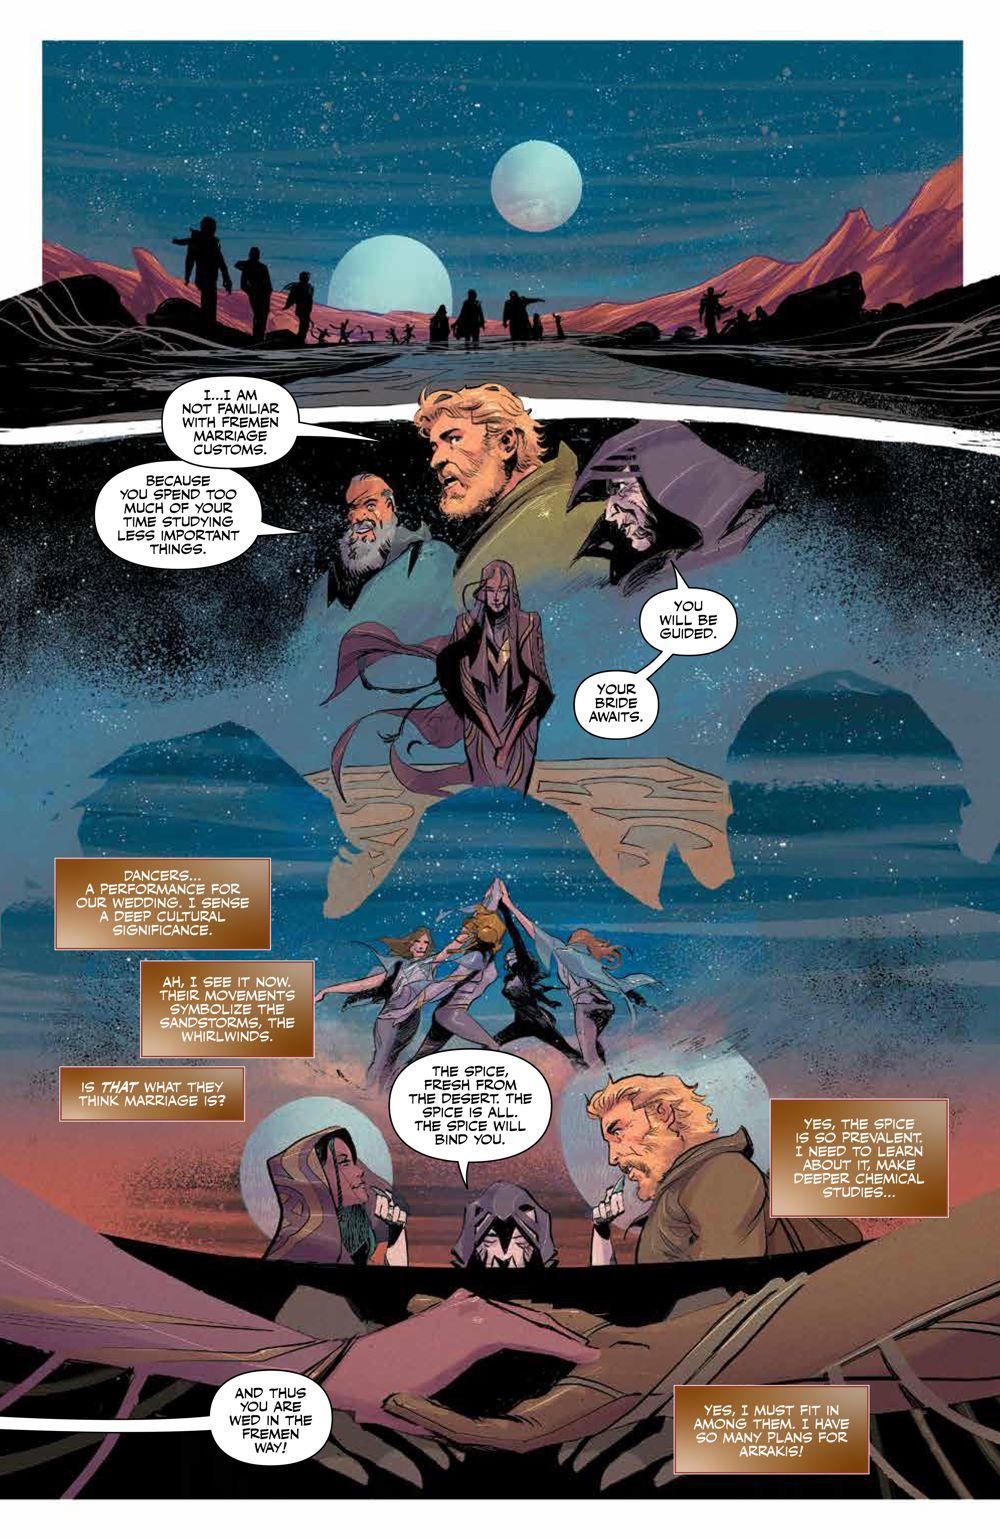 Dune_HouseAtreides_007_PRESS_5 ComicList Previews: DUNE HOUSE ATREIDES #7 (OF 12)